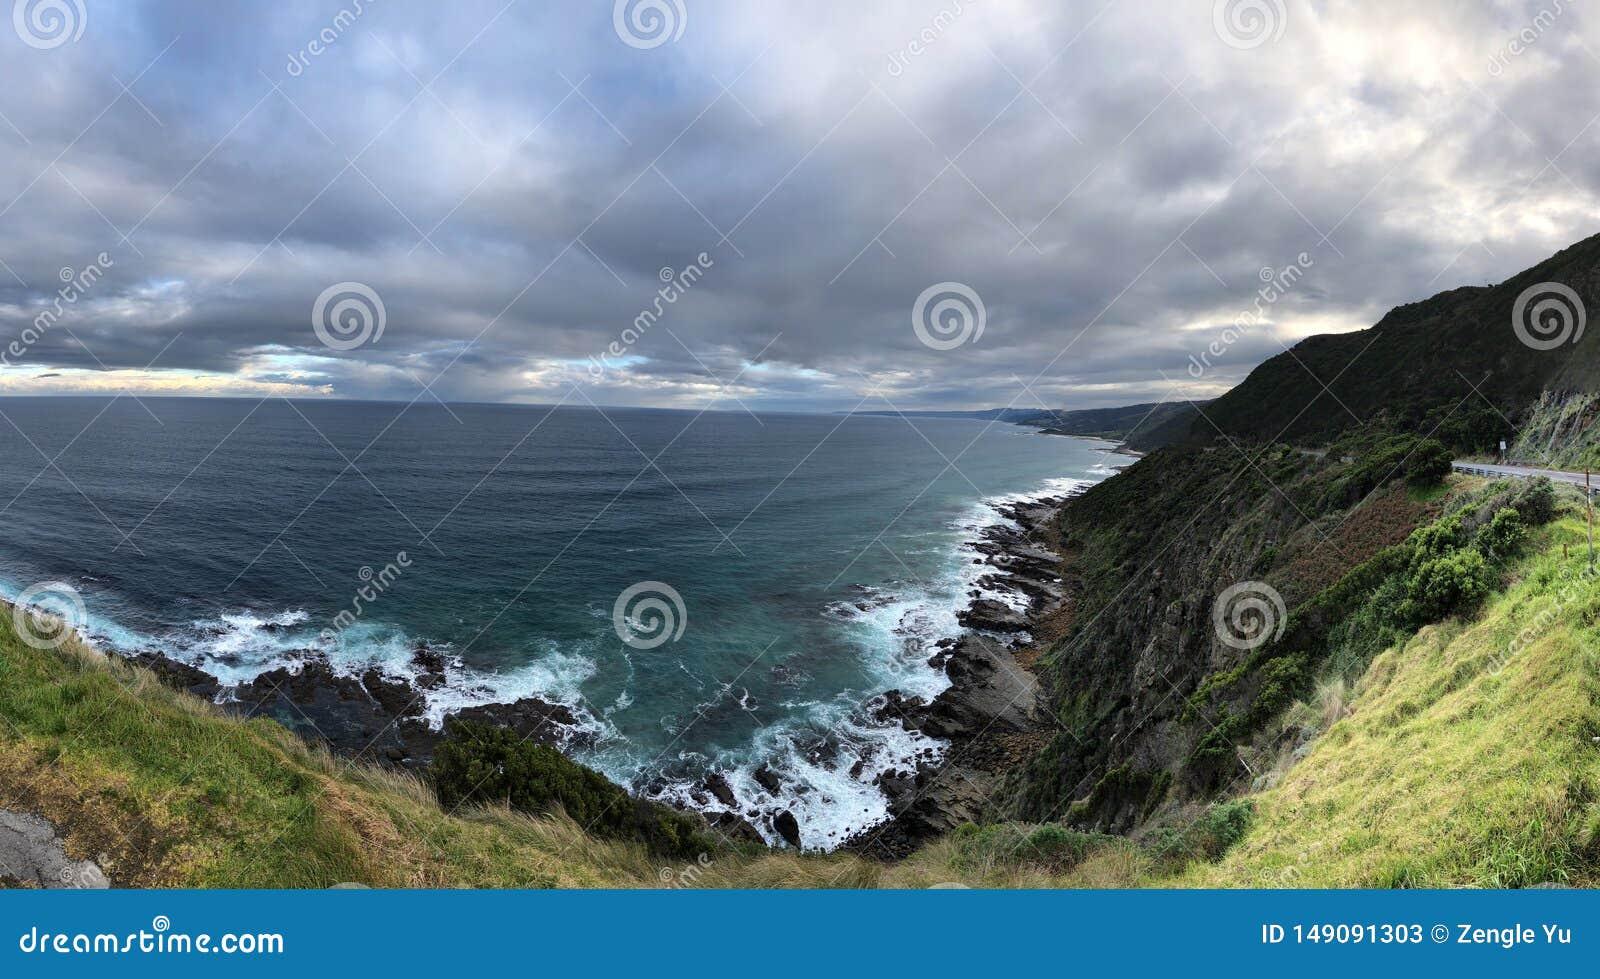 Blue sky, white surf, rocky coast, white clouds